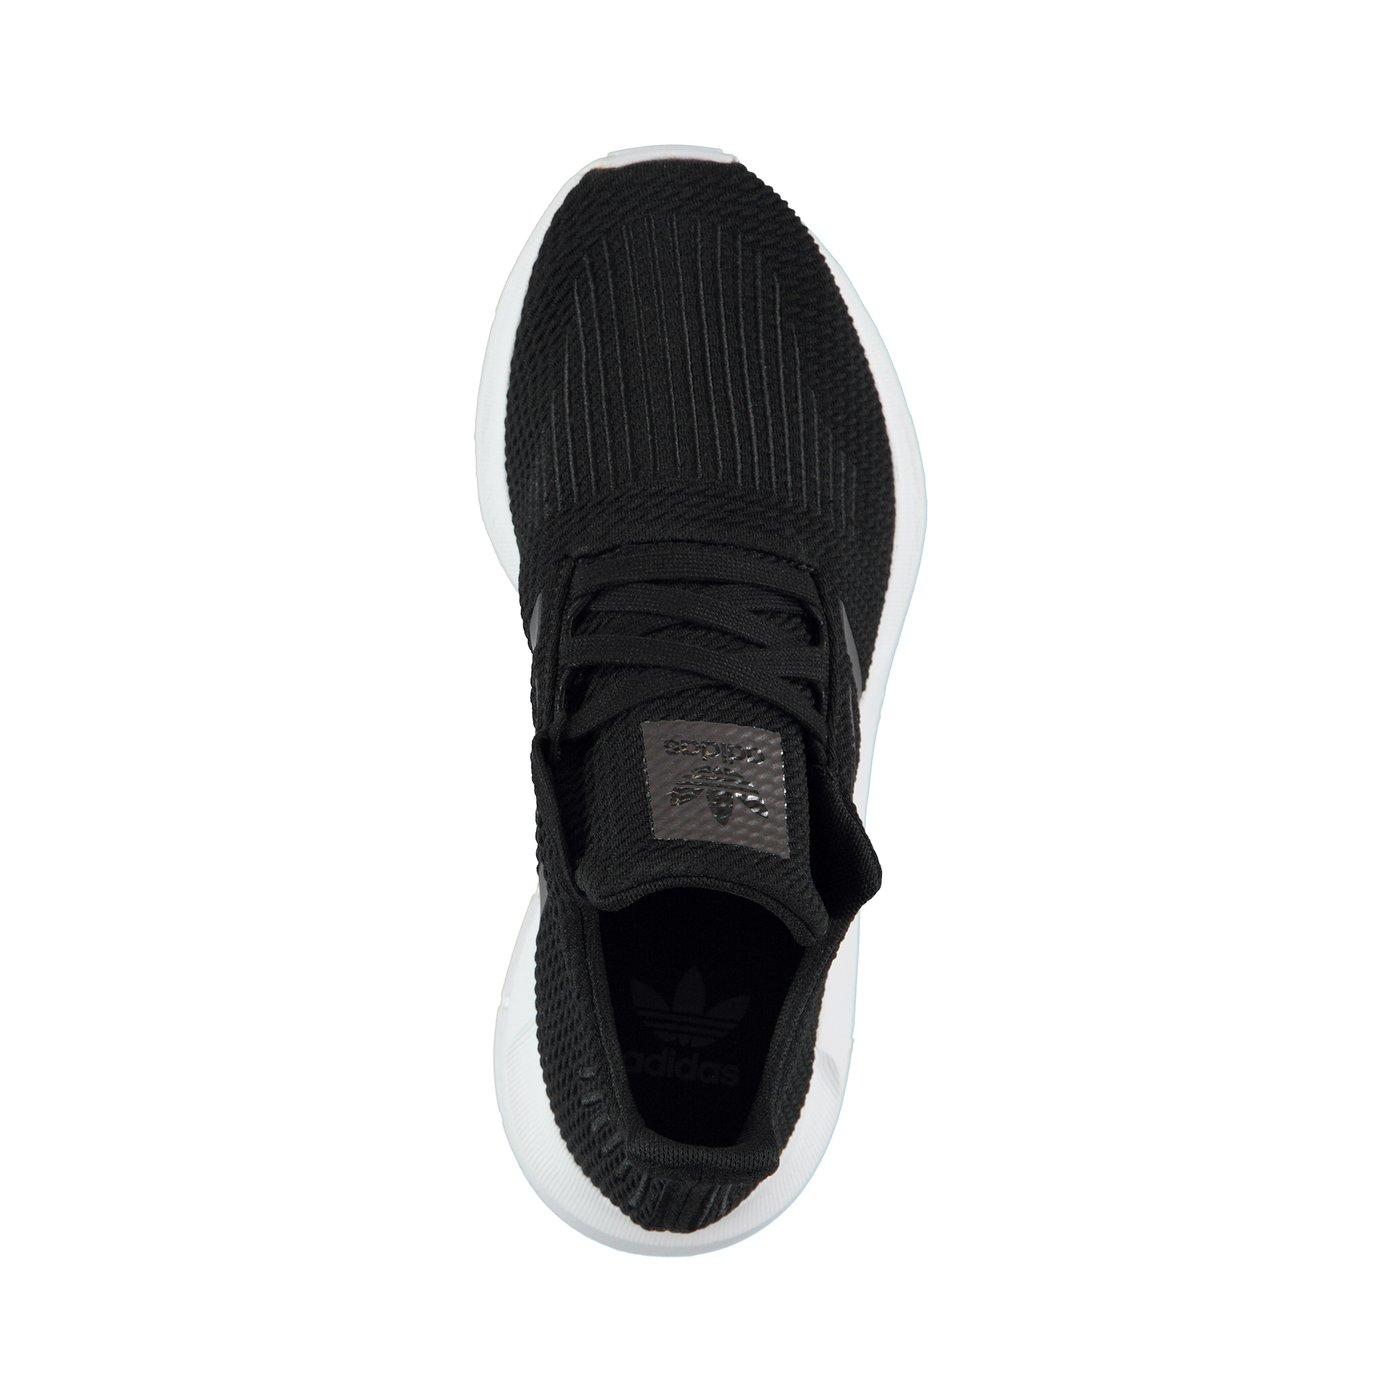 adidas Originals Swift Run Kadın Siyah Spor Ayakkabı